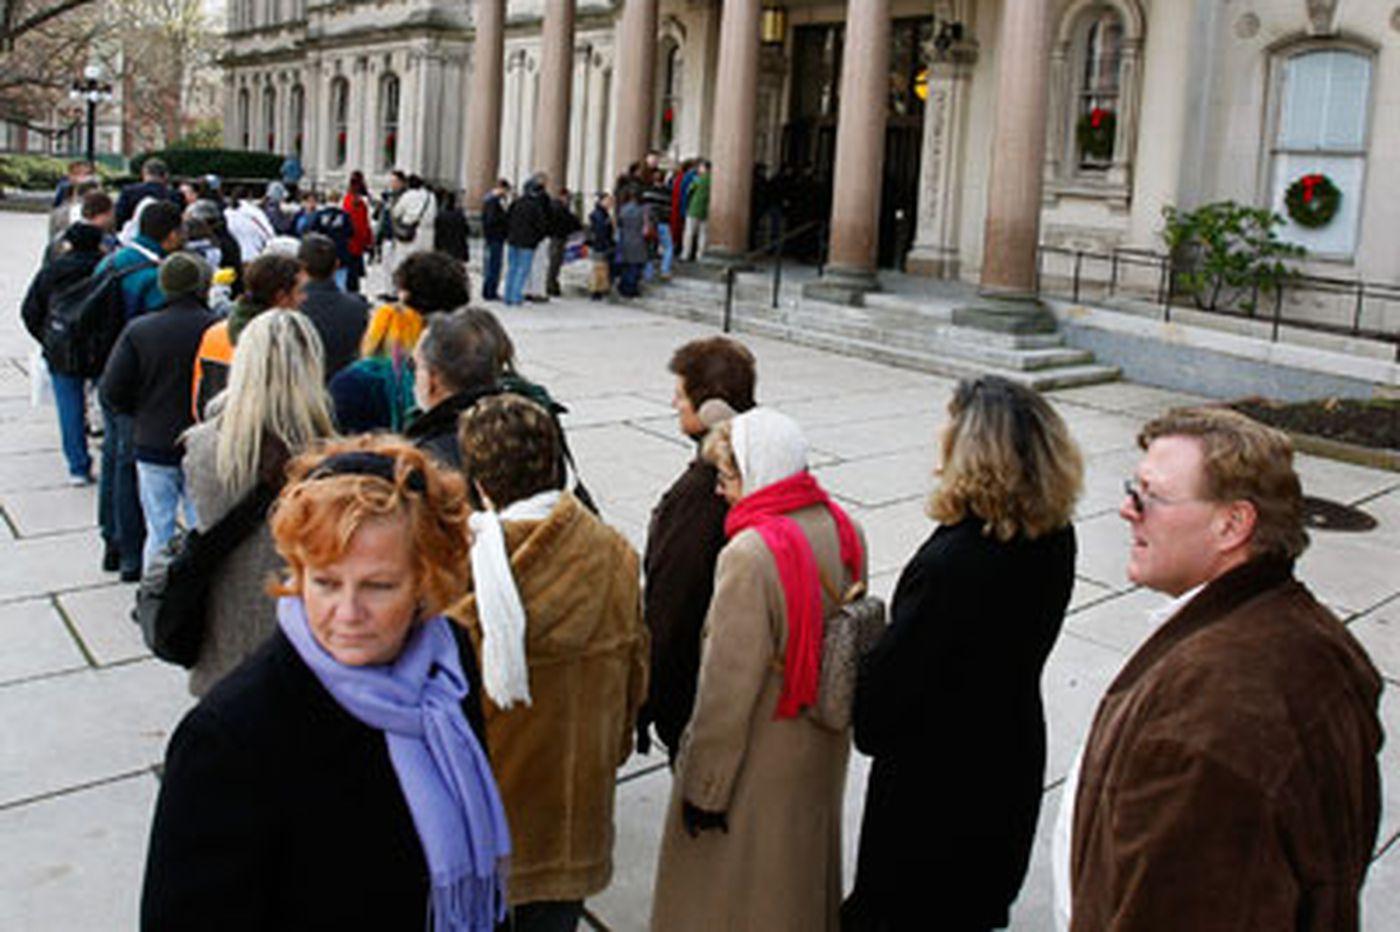 Same-sex marriage advocates delay N.J. Senate vote